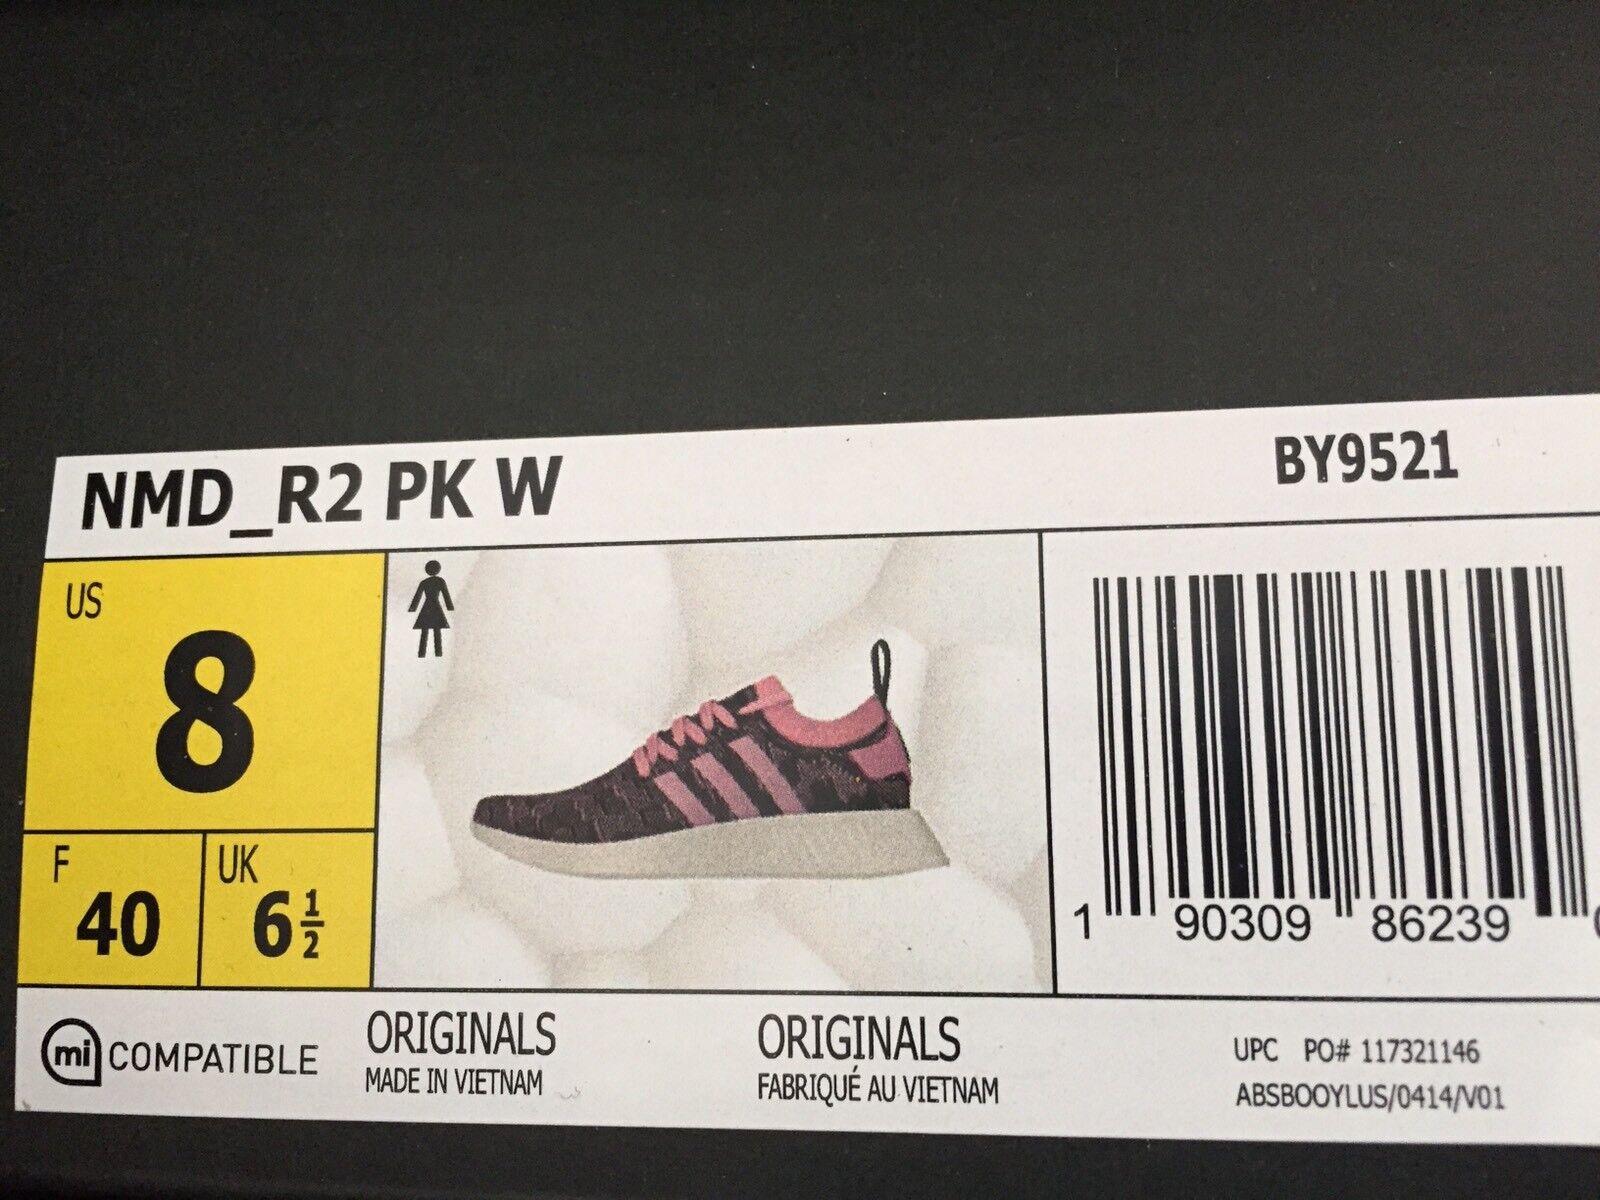 d9a4ec1d92827 ... Adidas Women NMD R2 PK W W W Wonder Pink CAMO Glitch Primeknit Boost  Black White 8 e90f0d. W NIKE WMNS AIR ...